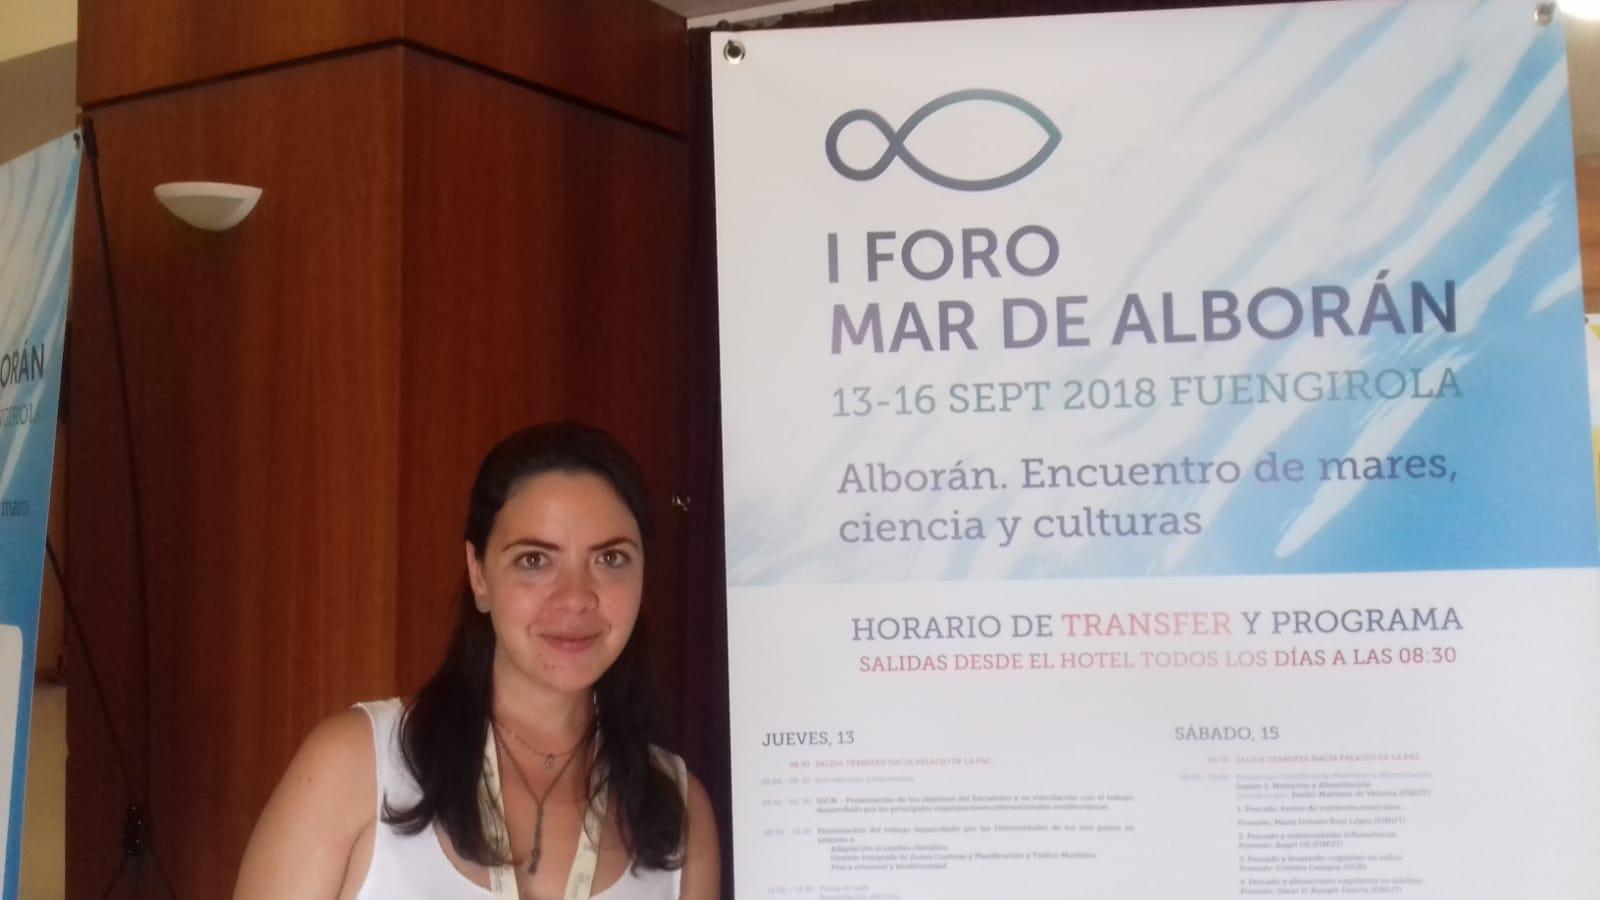 Cristina Bolumar, veterinaria especialista en tortugas marinas